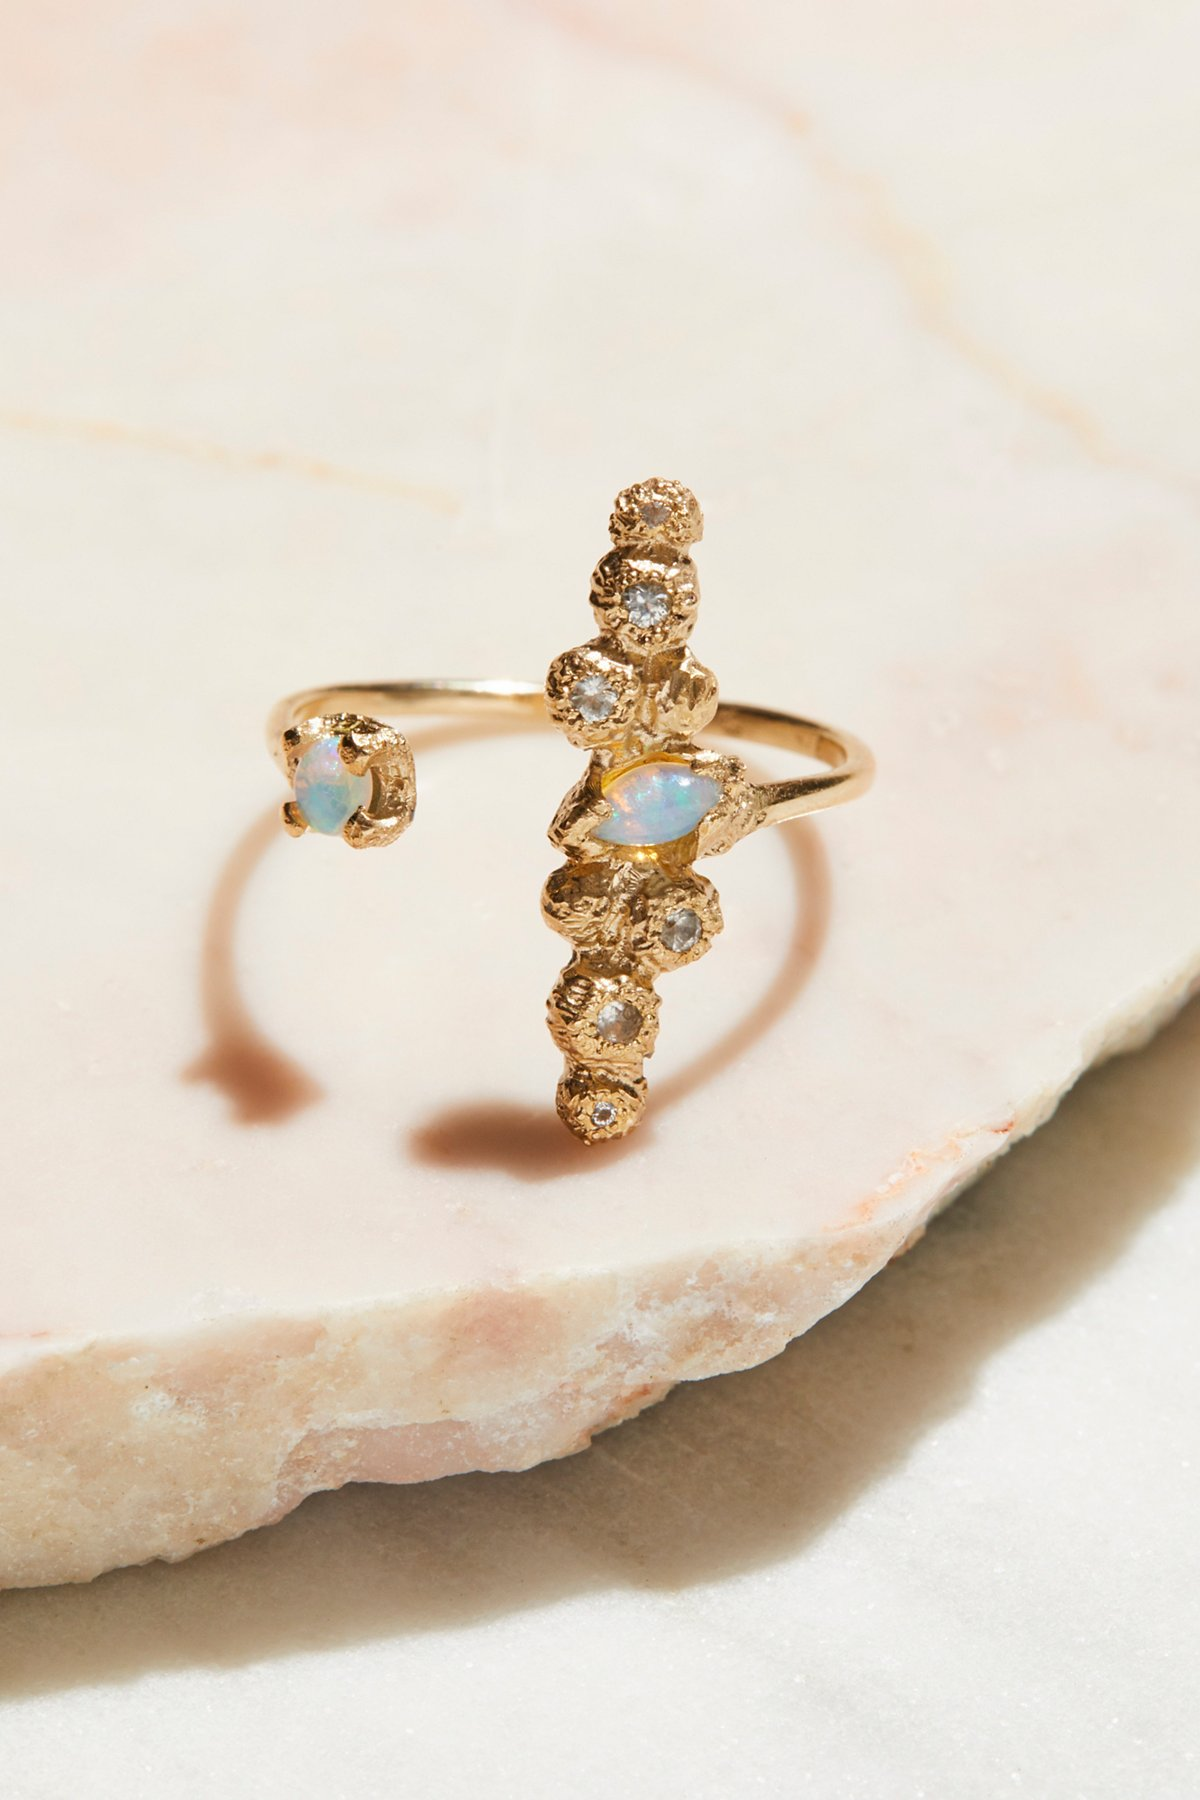 9k Opal x White Sapphire Cuff Ring